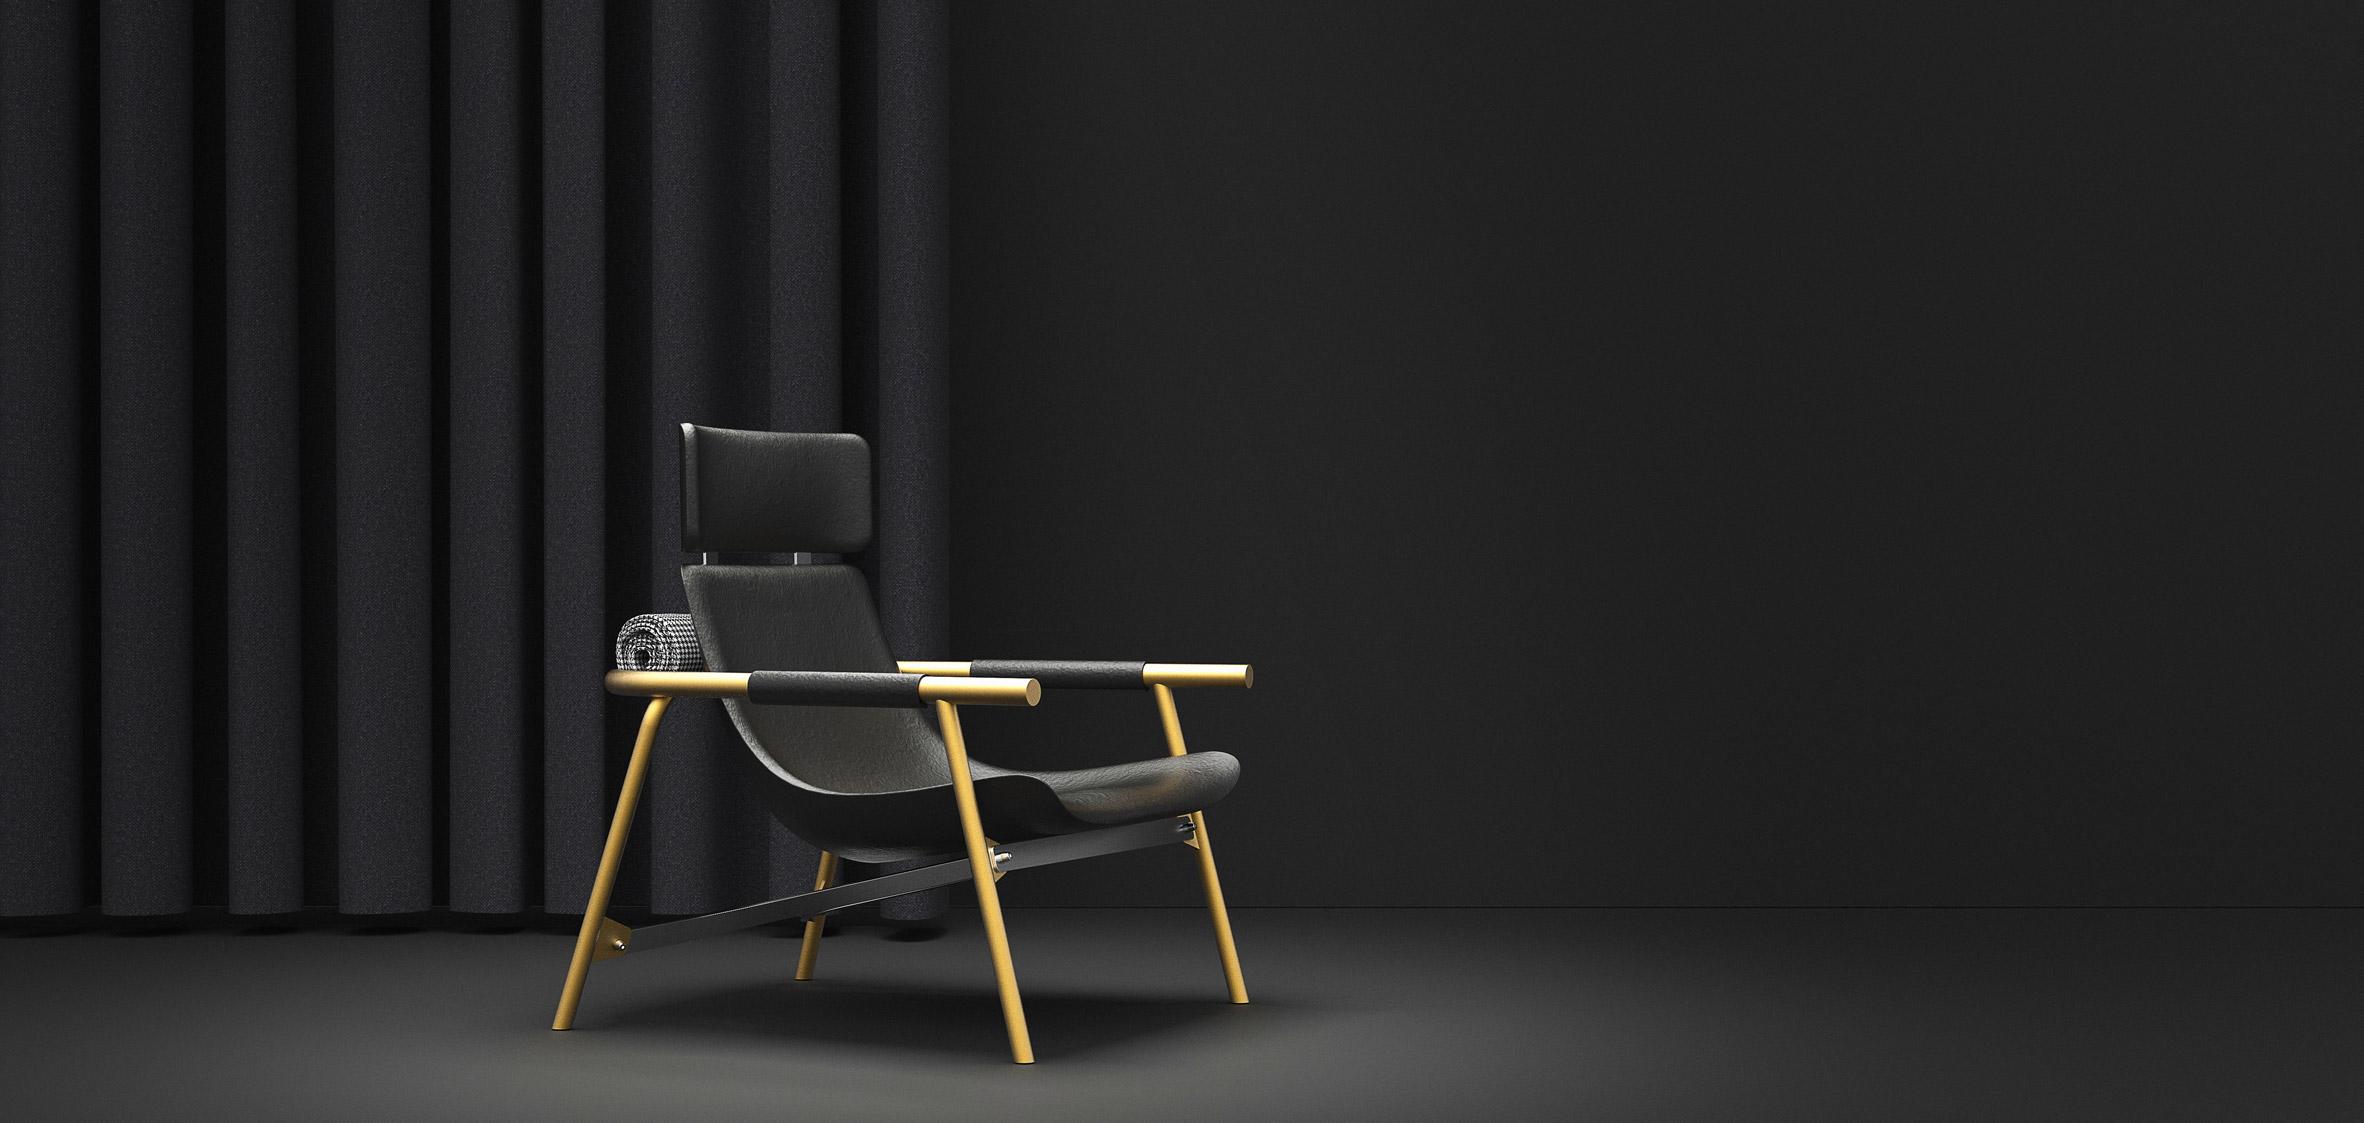 Pleasant Alain Gilles Creates Lounge Chair That References Vintage Pabps2019 Chair Design Images Pabps2019Com